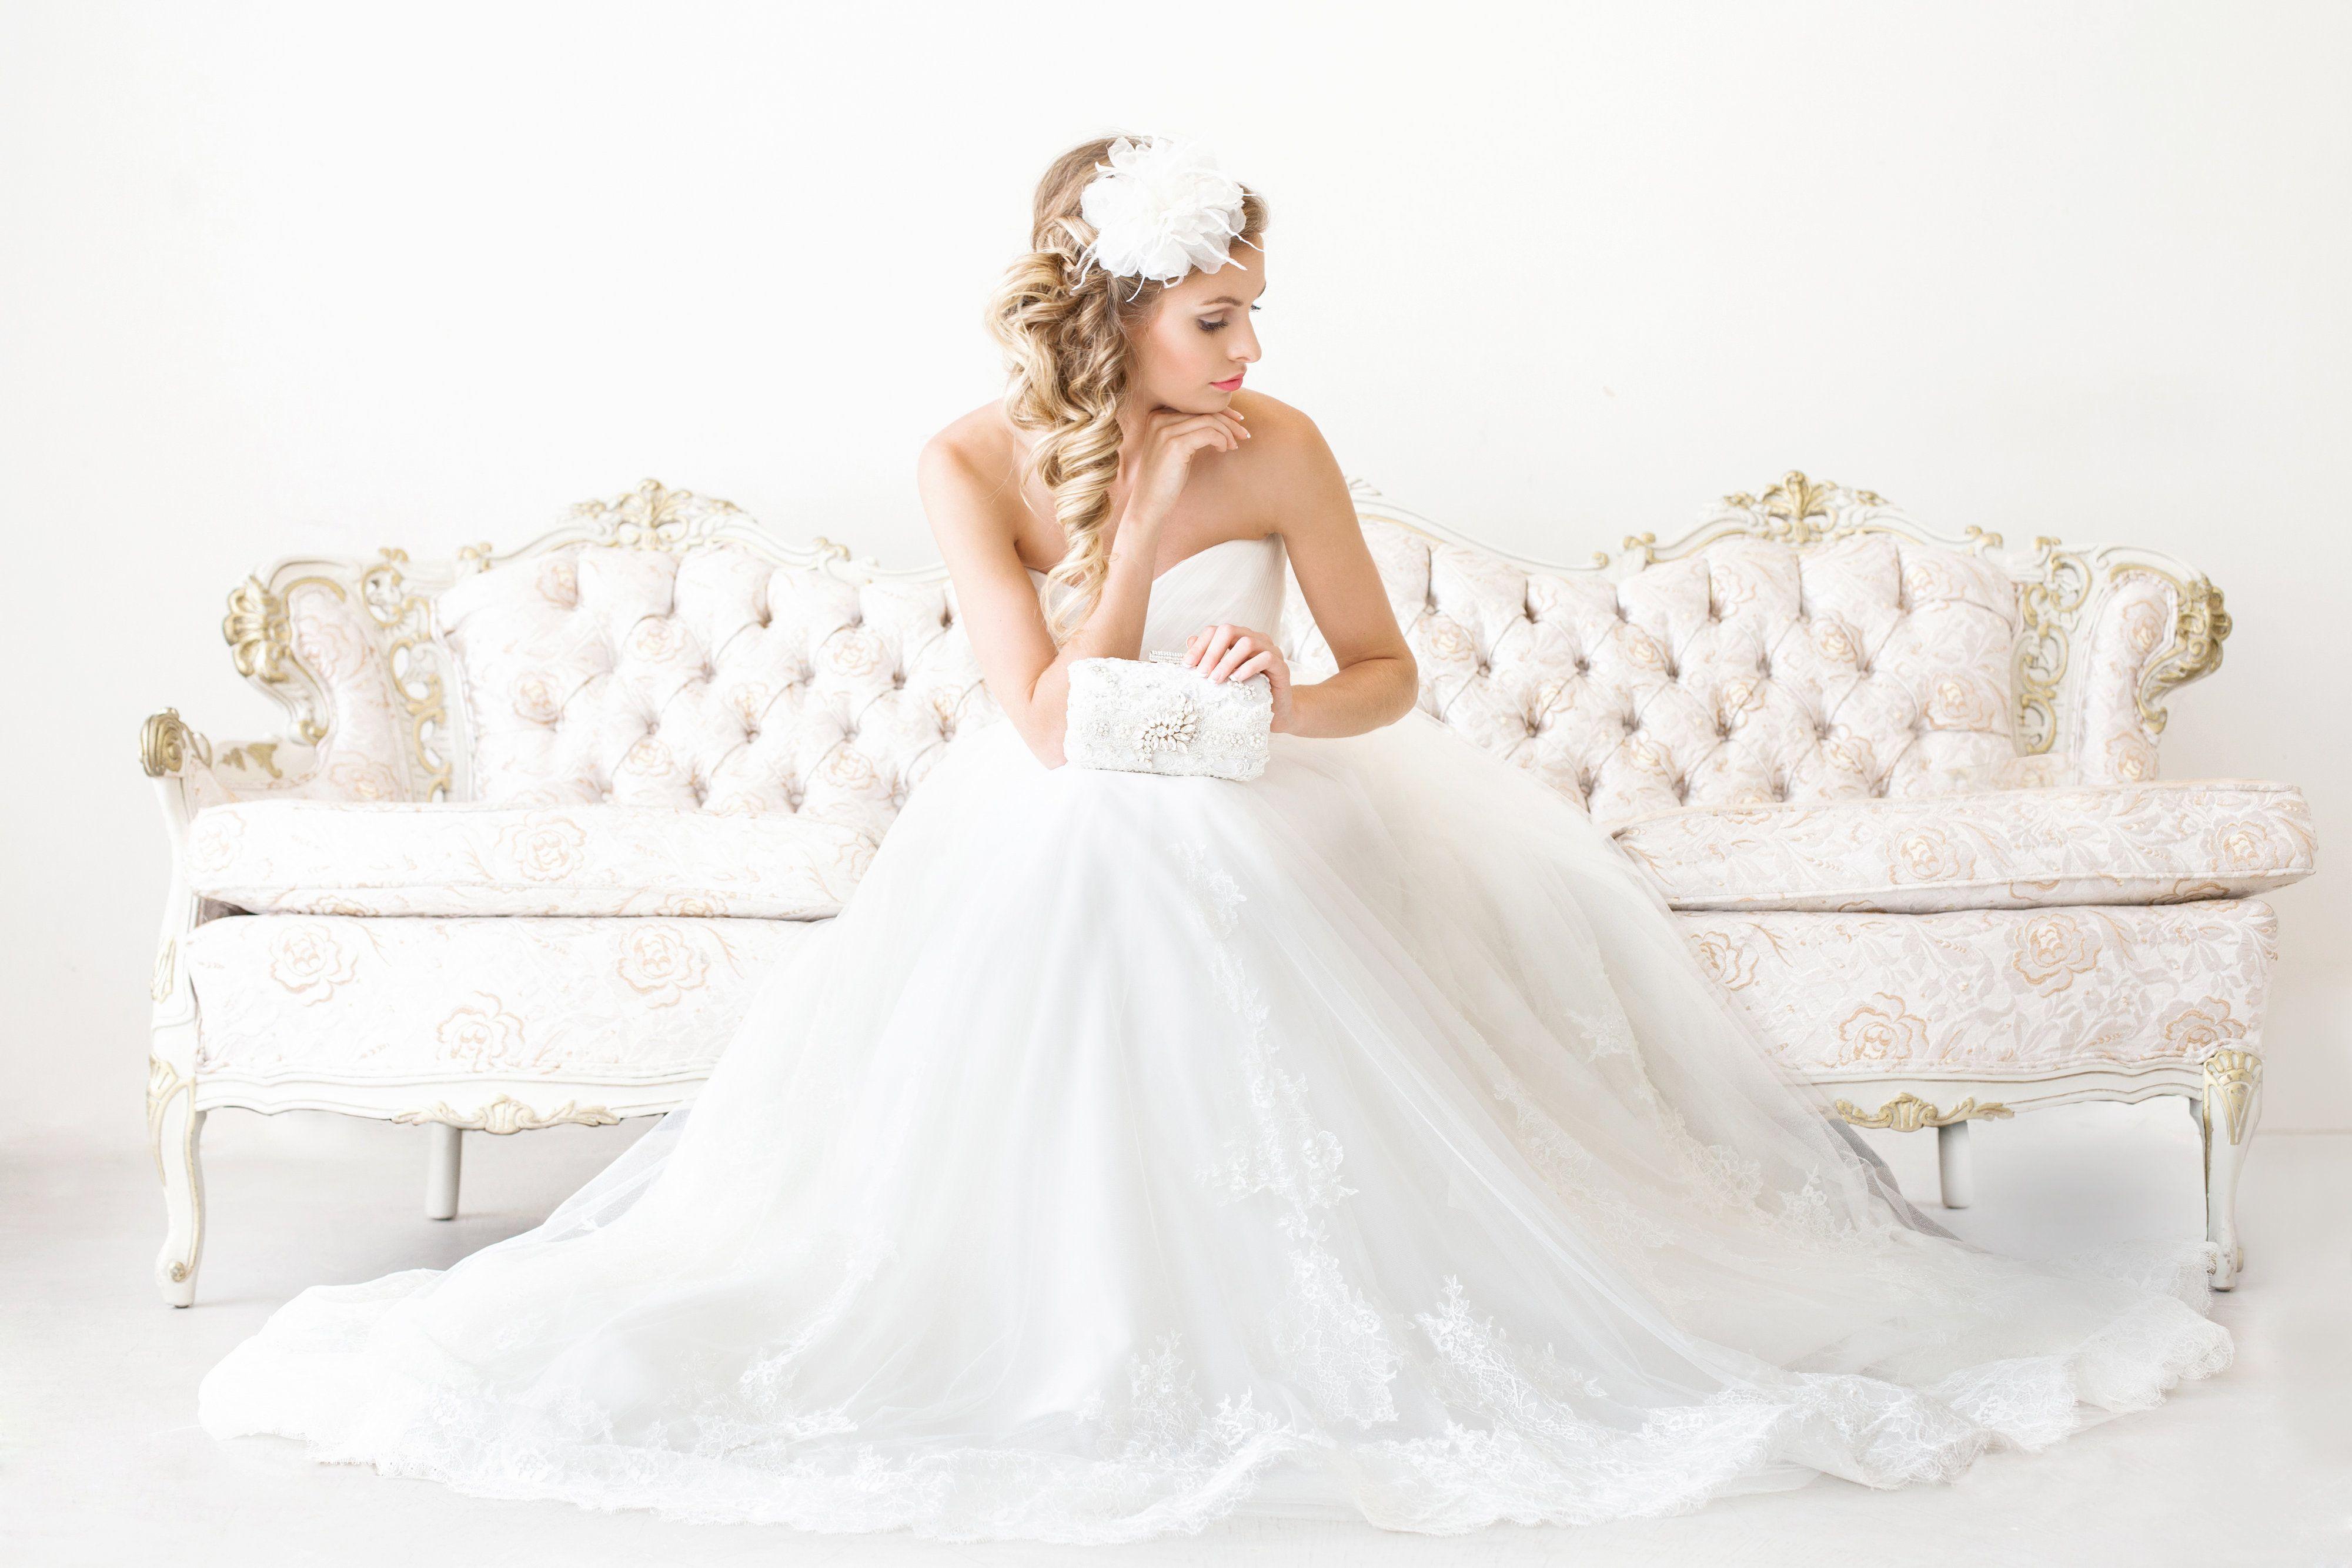 Wedding dresses pittsburgh  Pin lisääjältä PAPER u LACE taulussa Wedding Dresses Shoes and